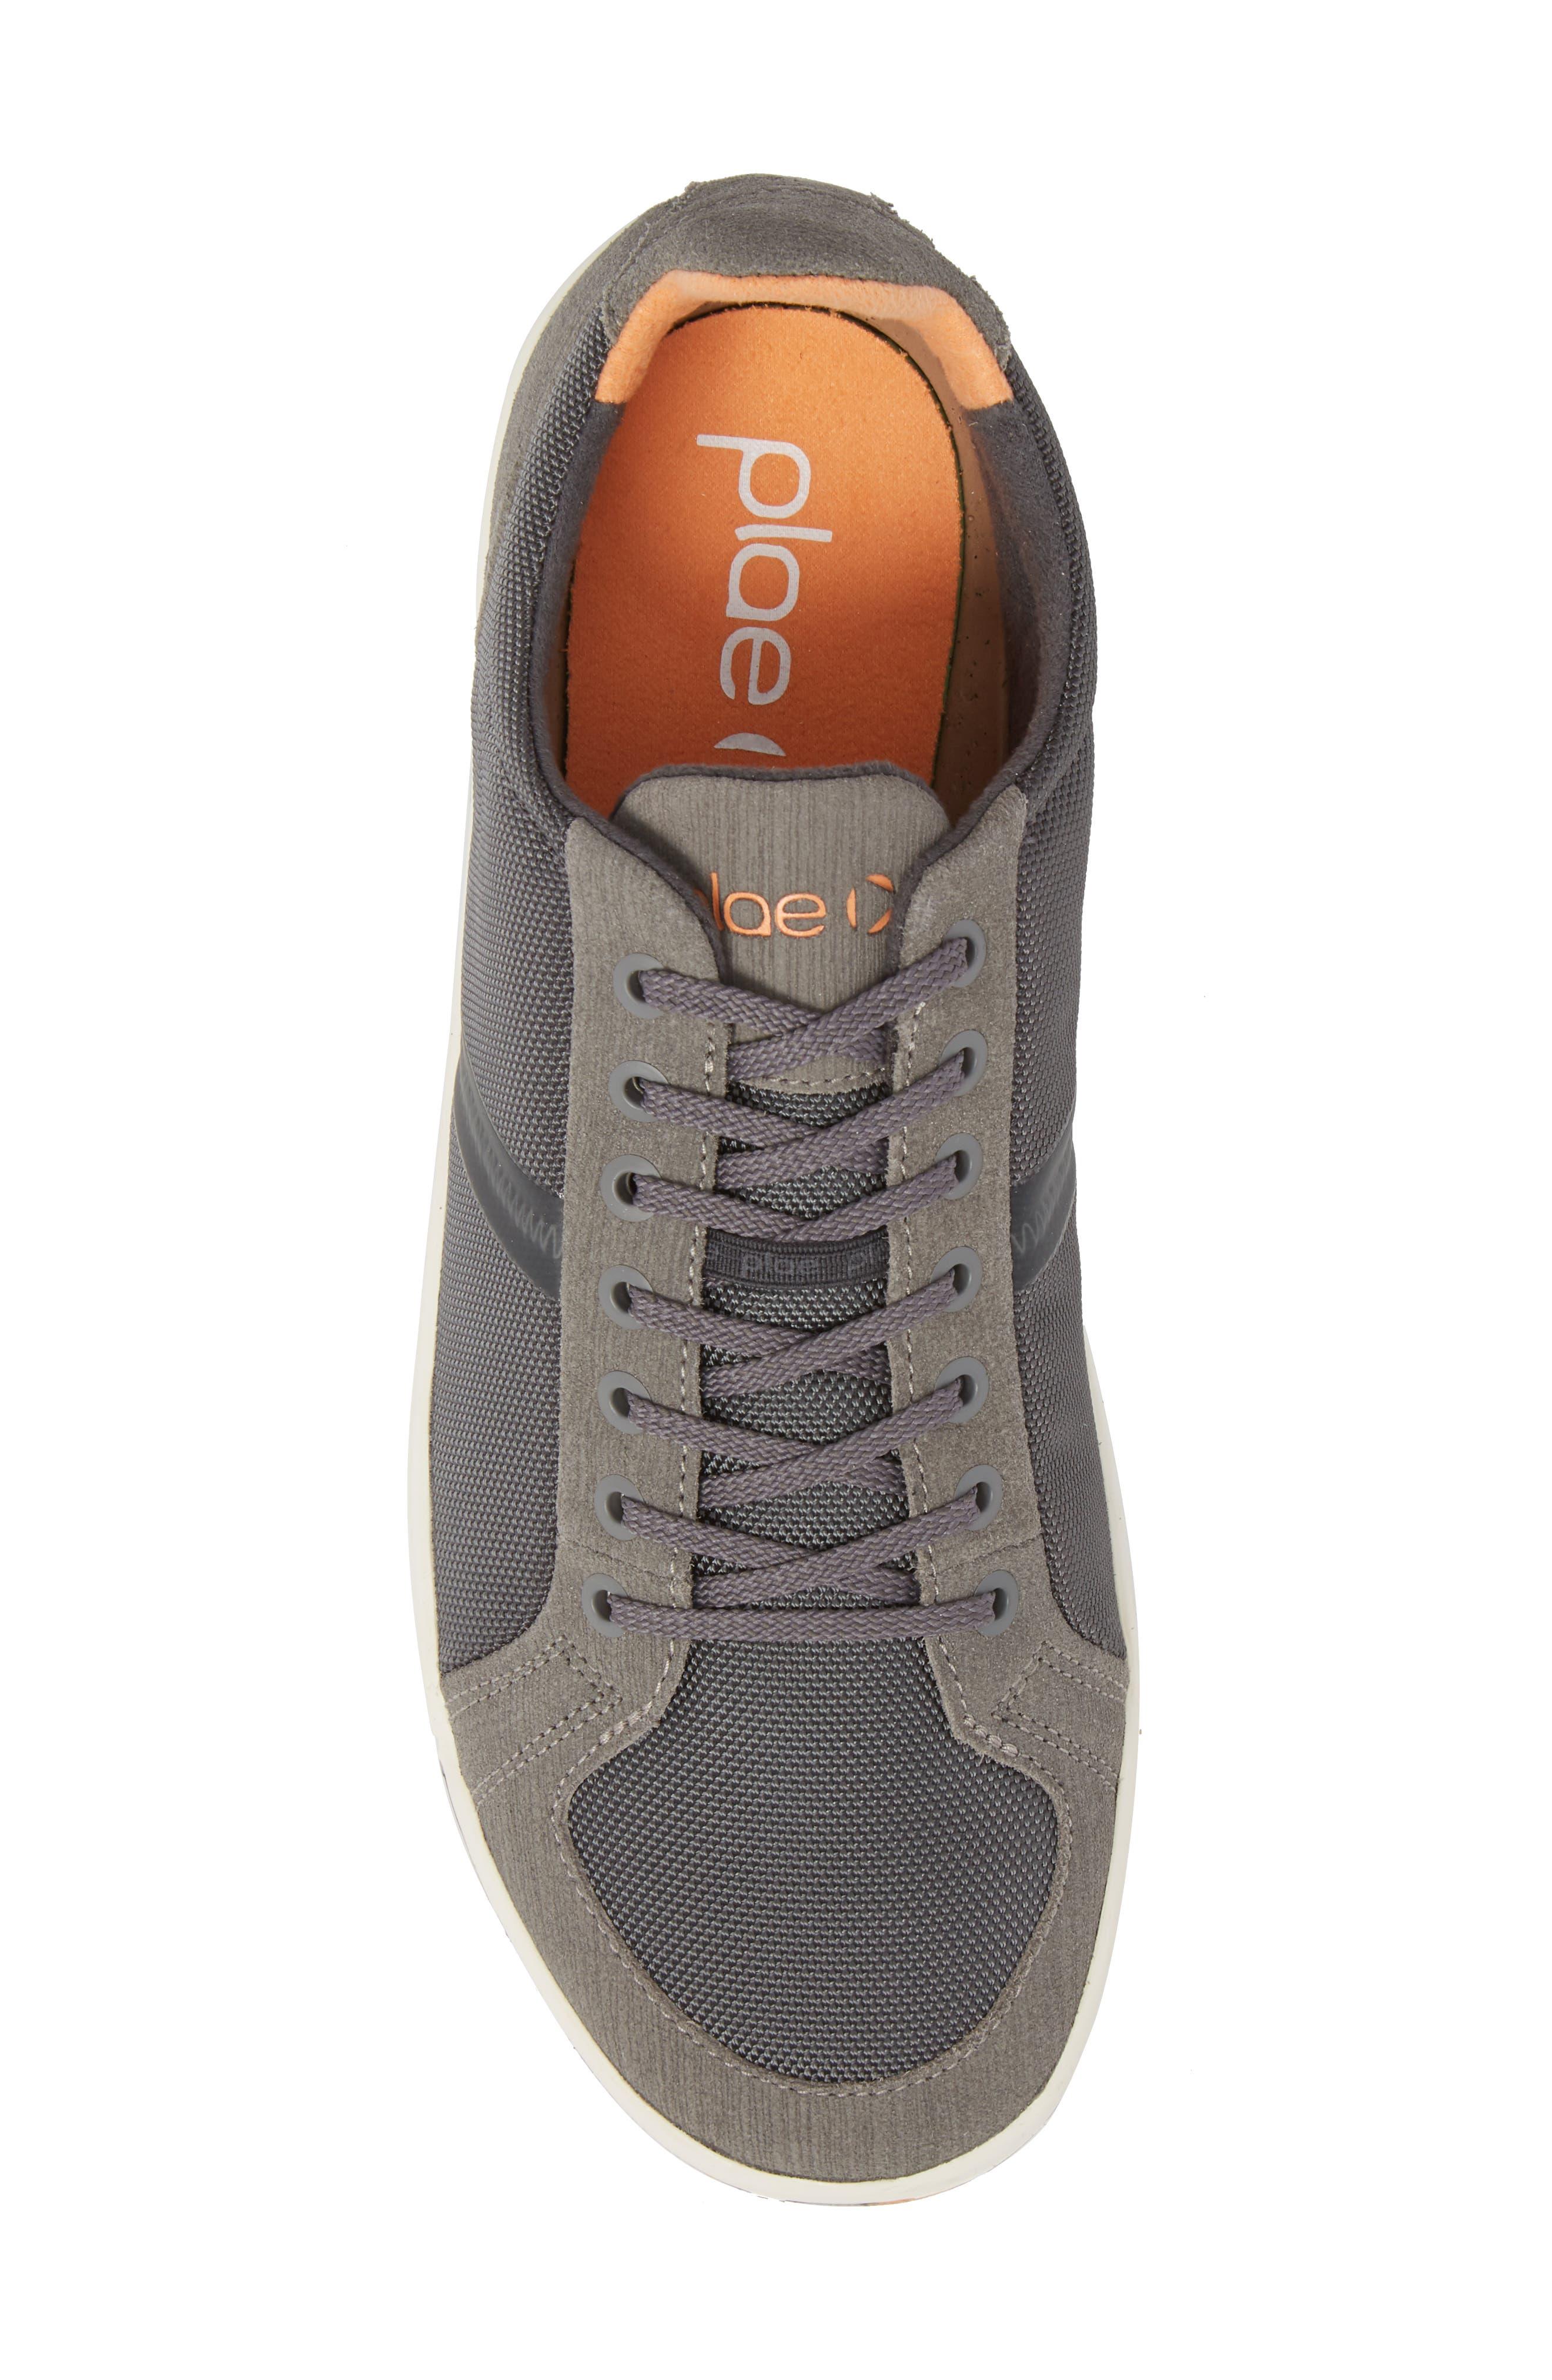 Prospect Low Top Sneaker,                             Alternate thumbnail 5, color,                             070